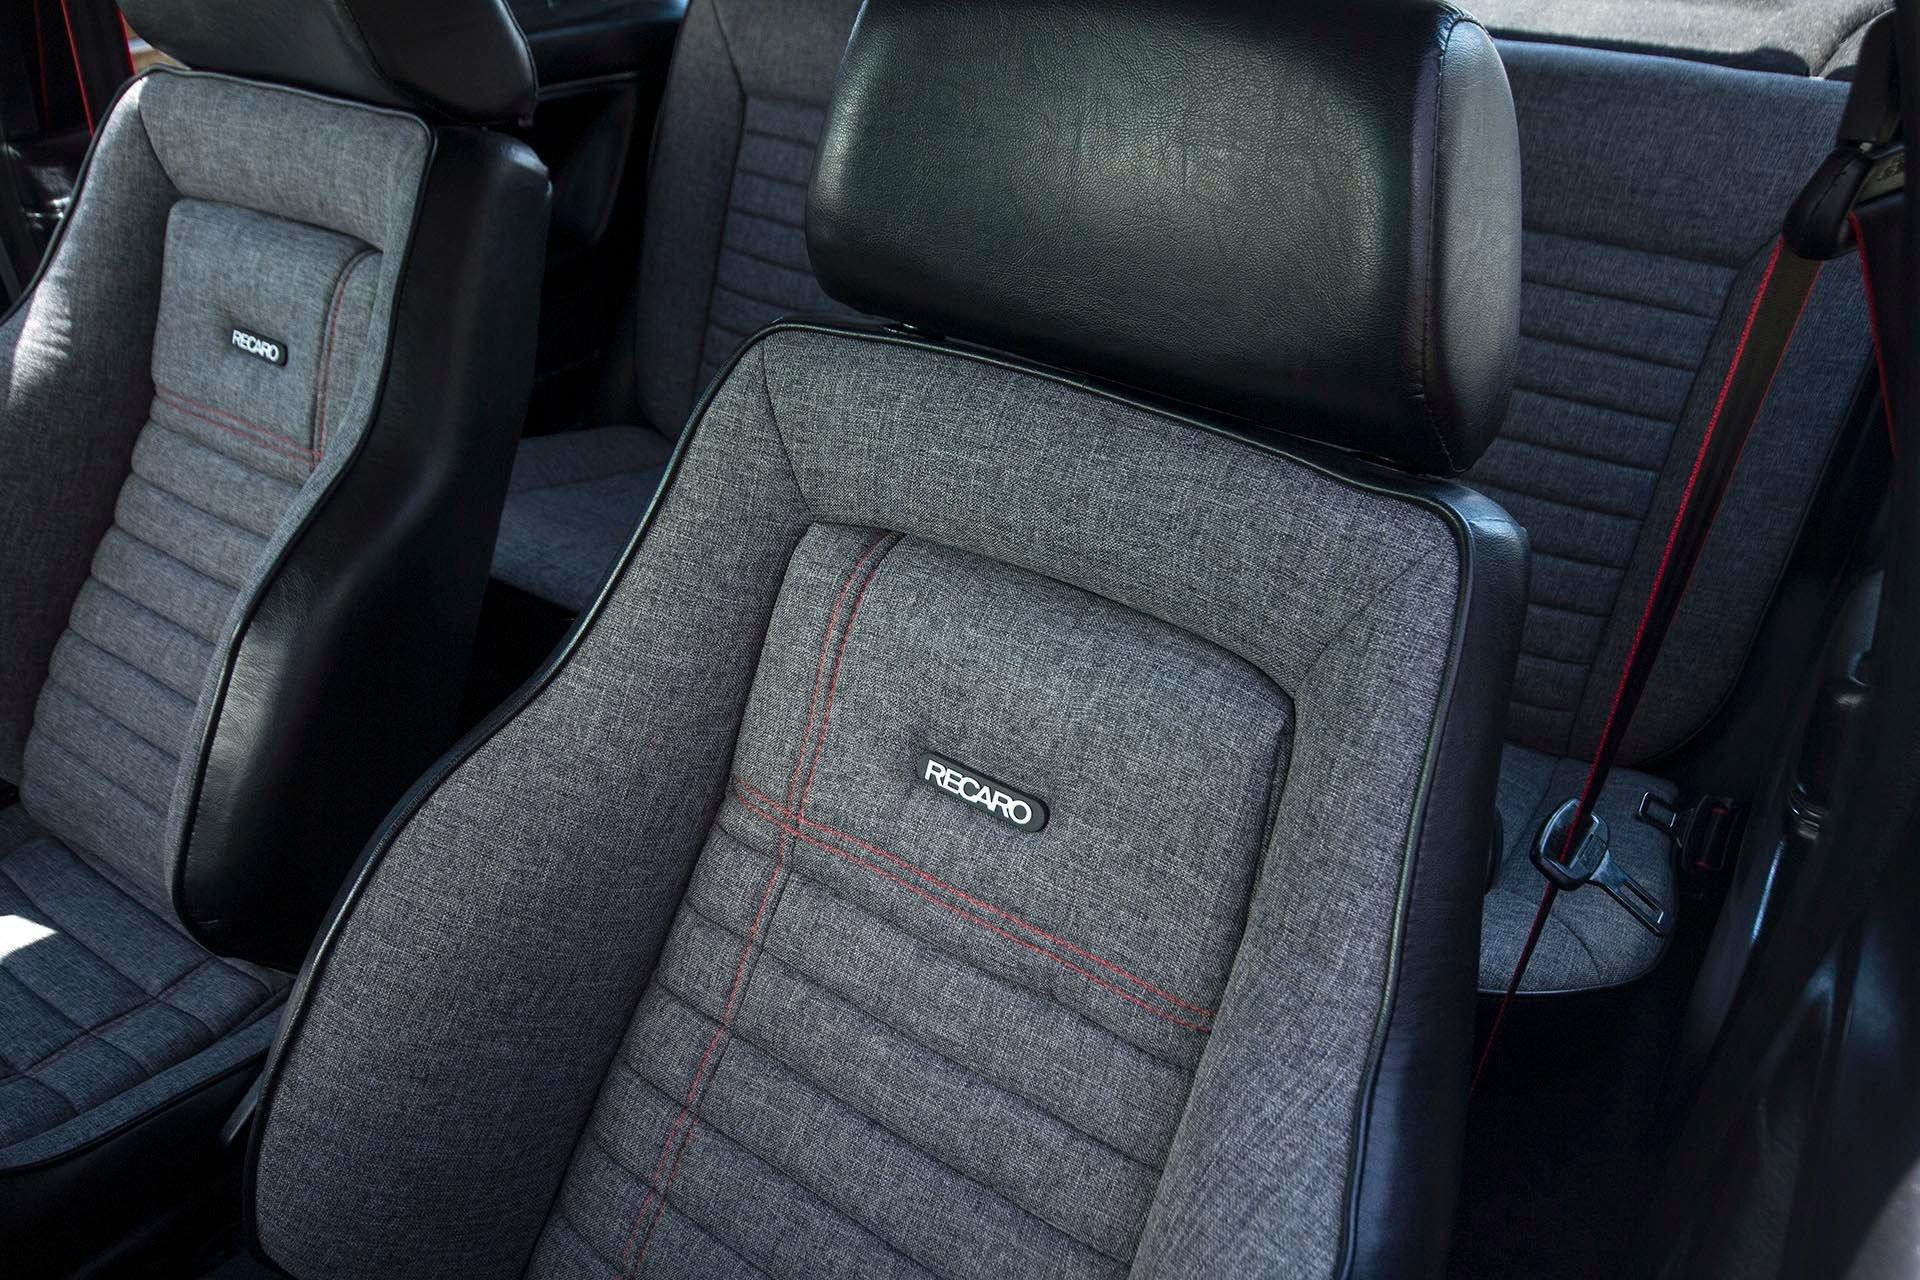 VW Mk2 Recaro Trophy custom seats